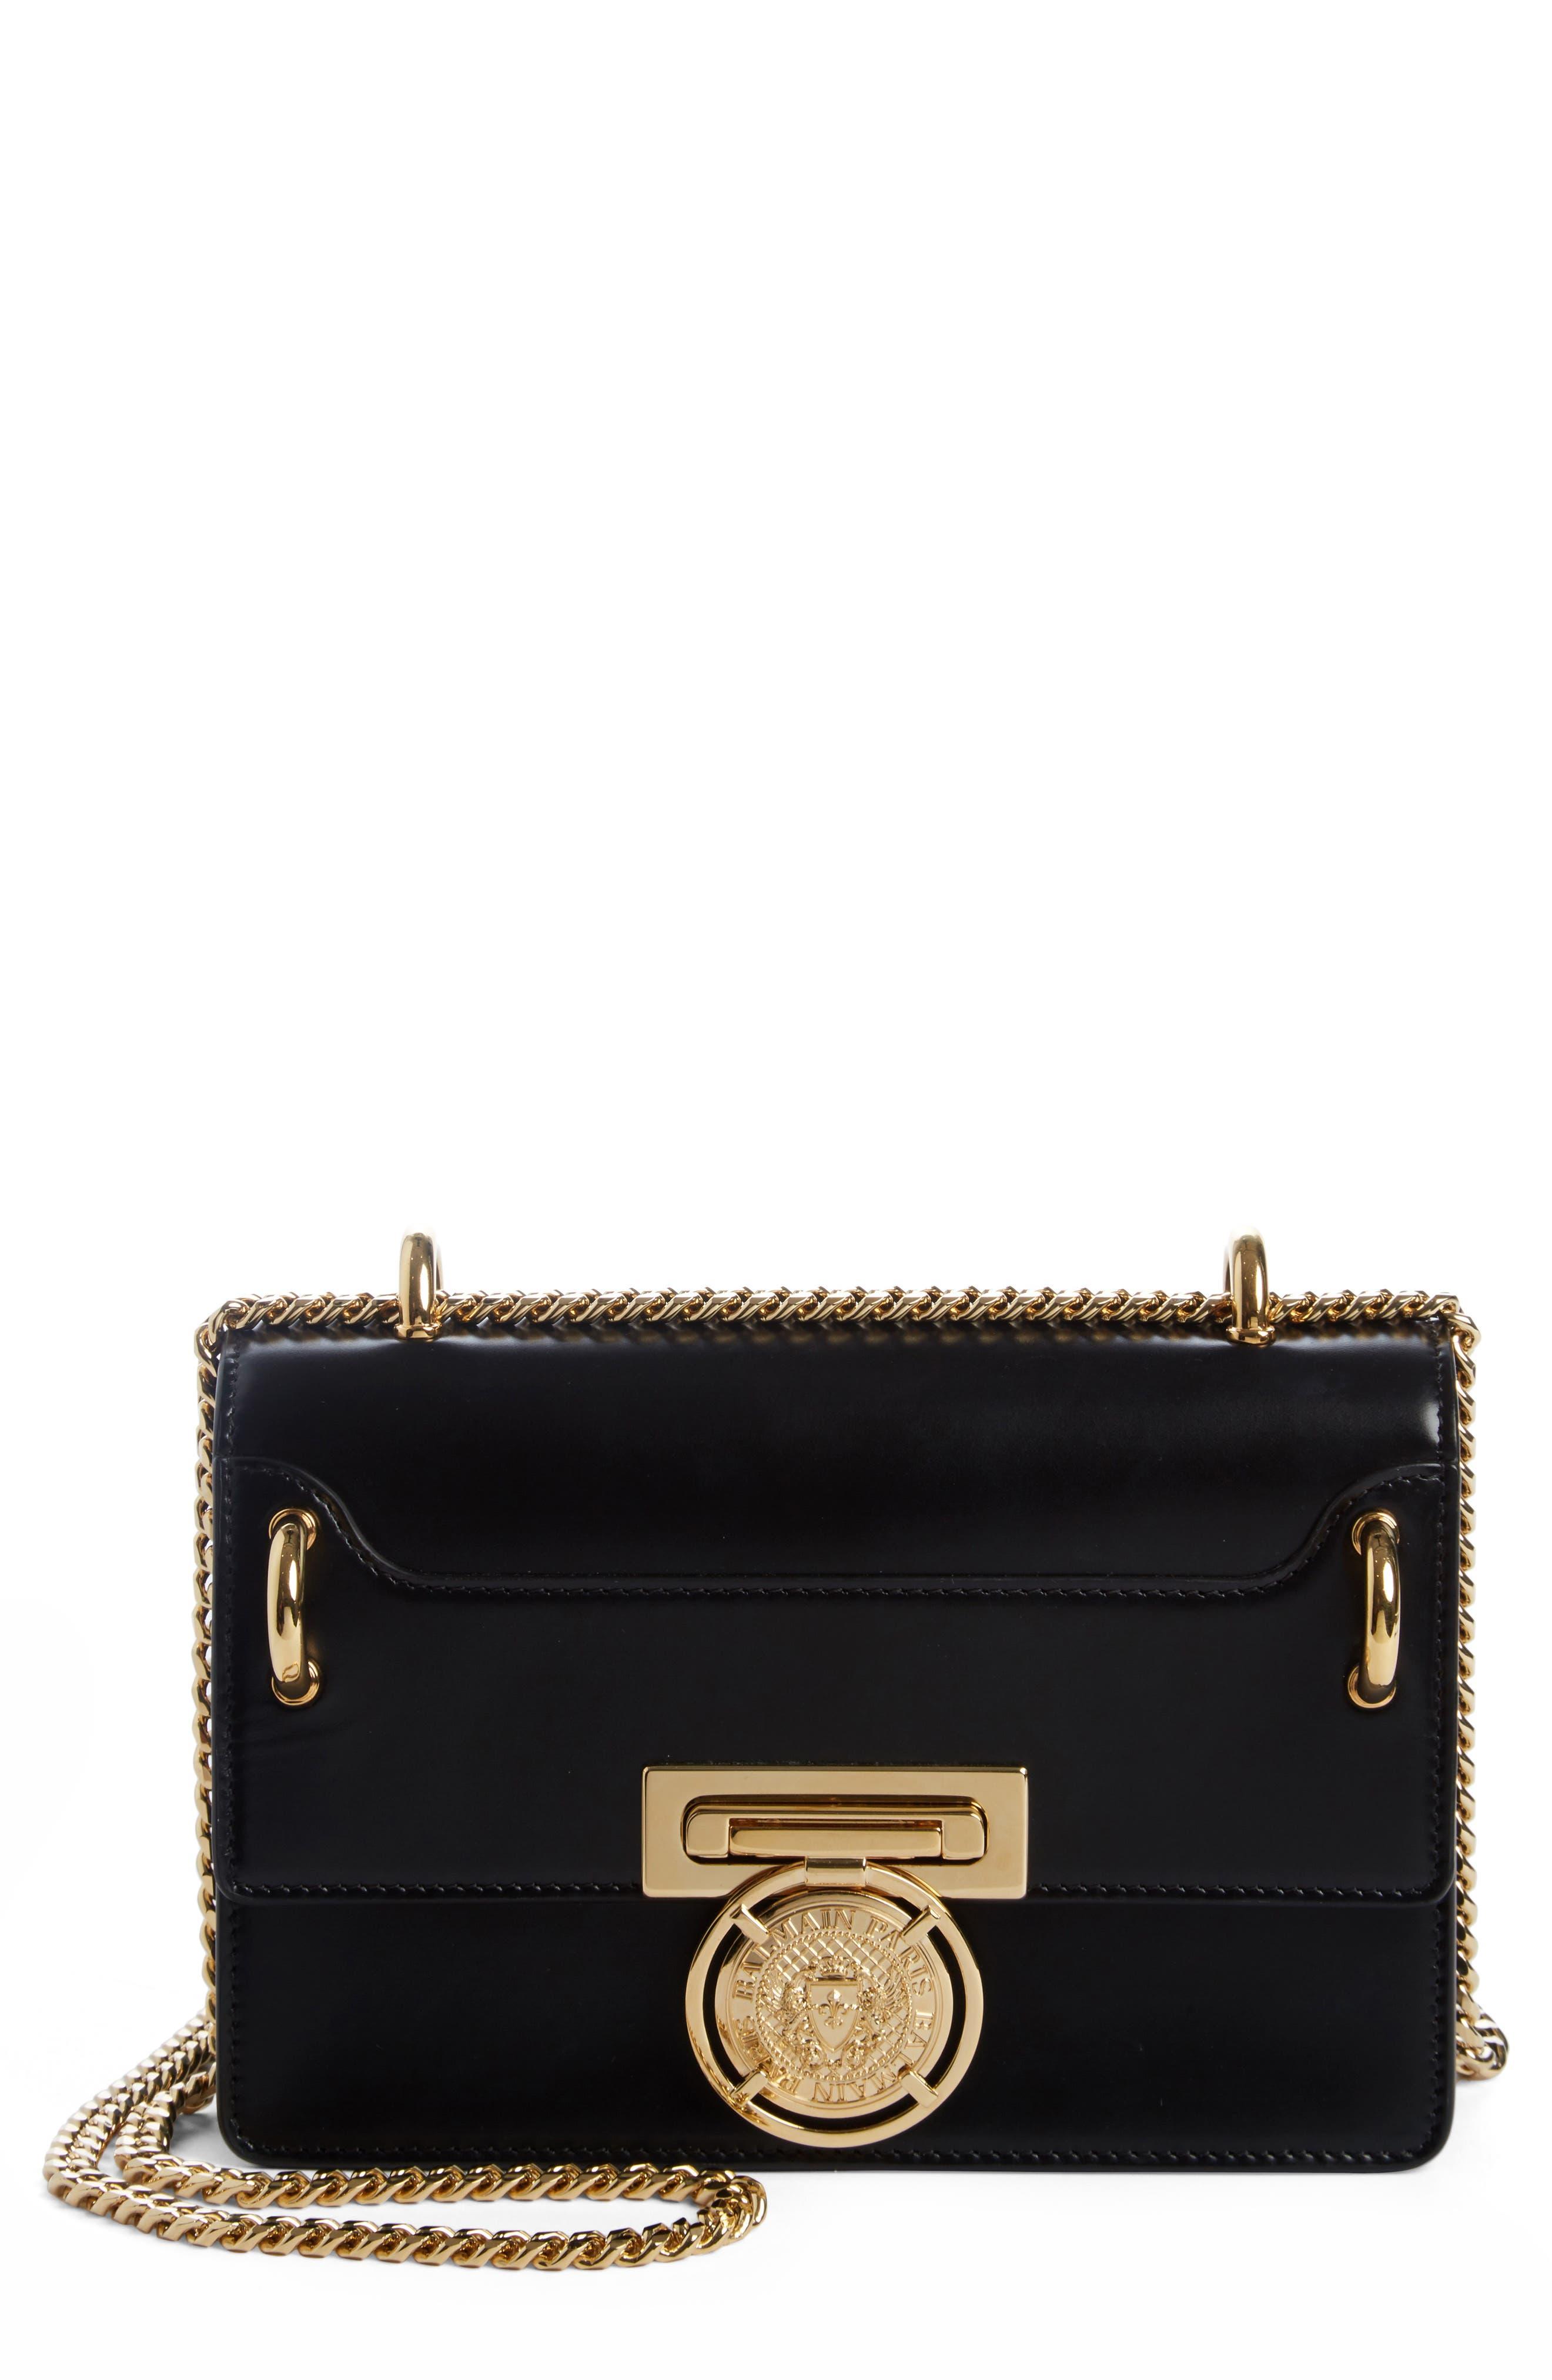 Main Image - Balmain Glace Leather Box Shoulder Bag